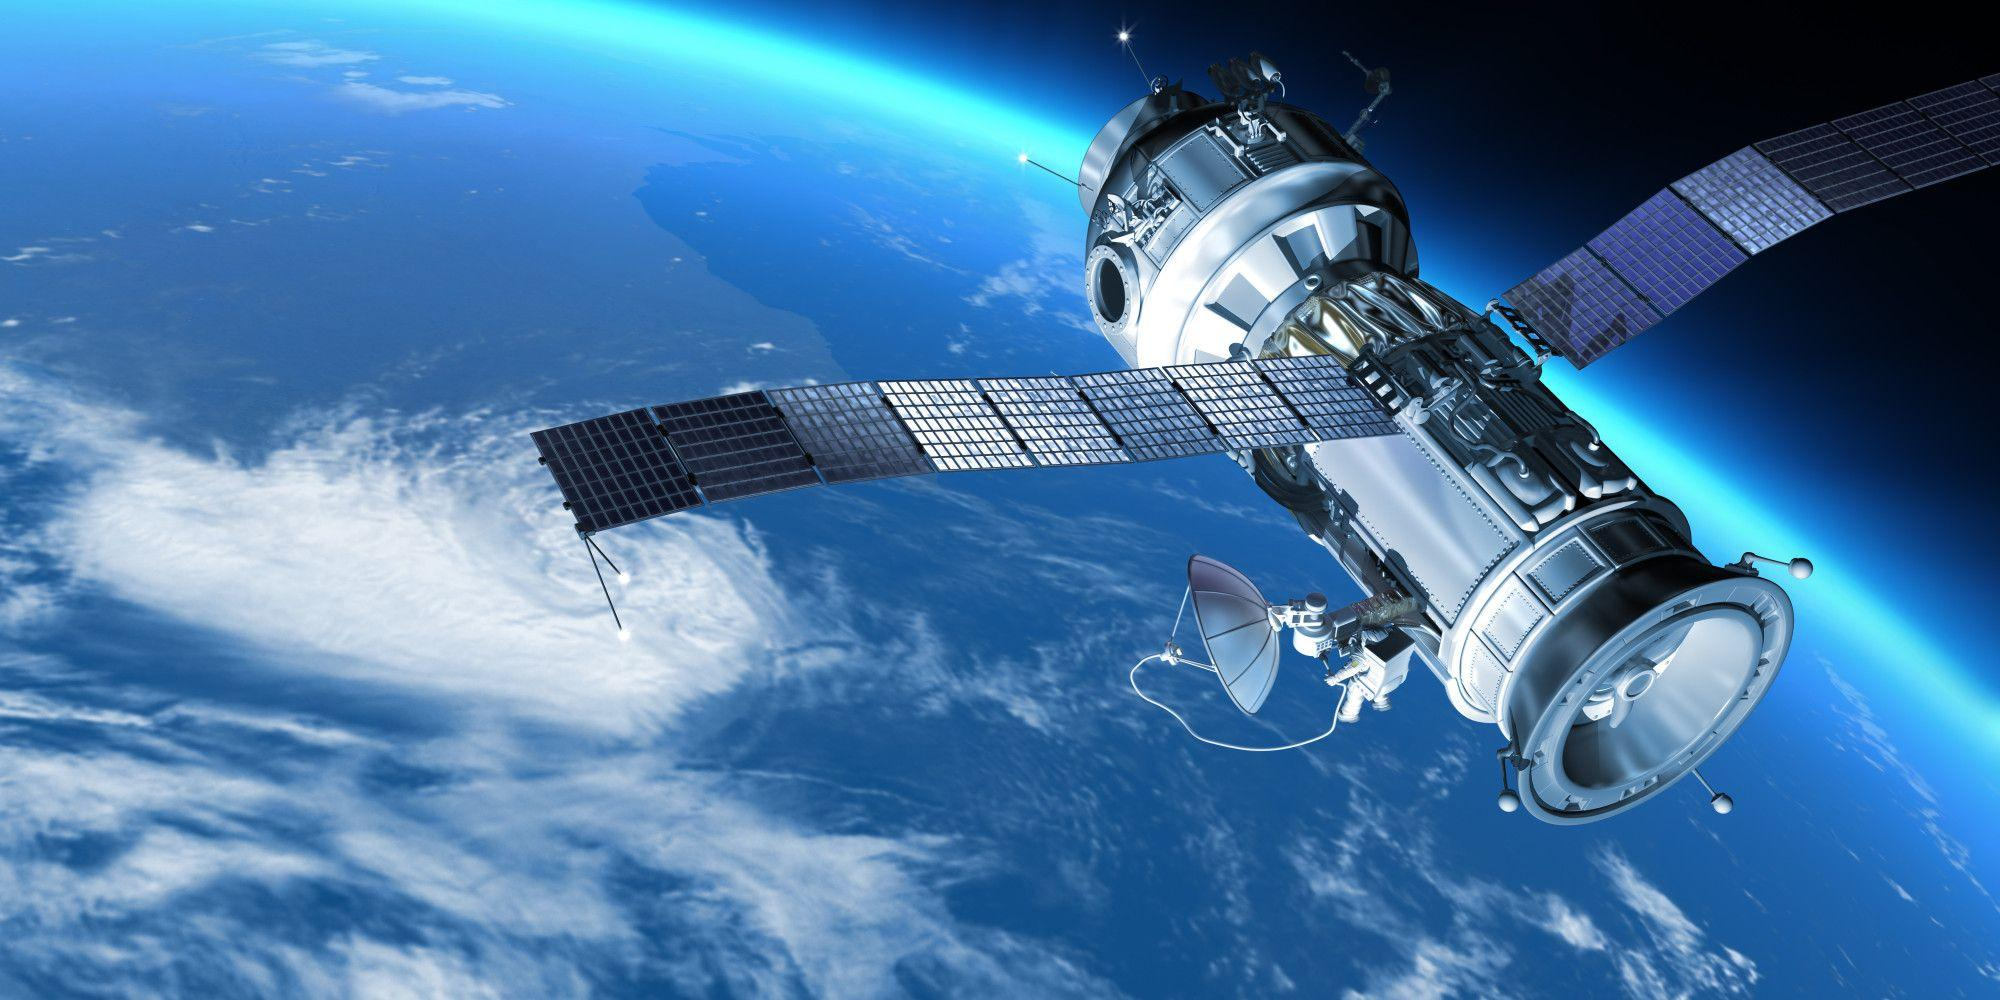 Satellite wallpapers wallpaper cave - Satellite wallpaper hd ...